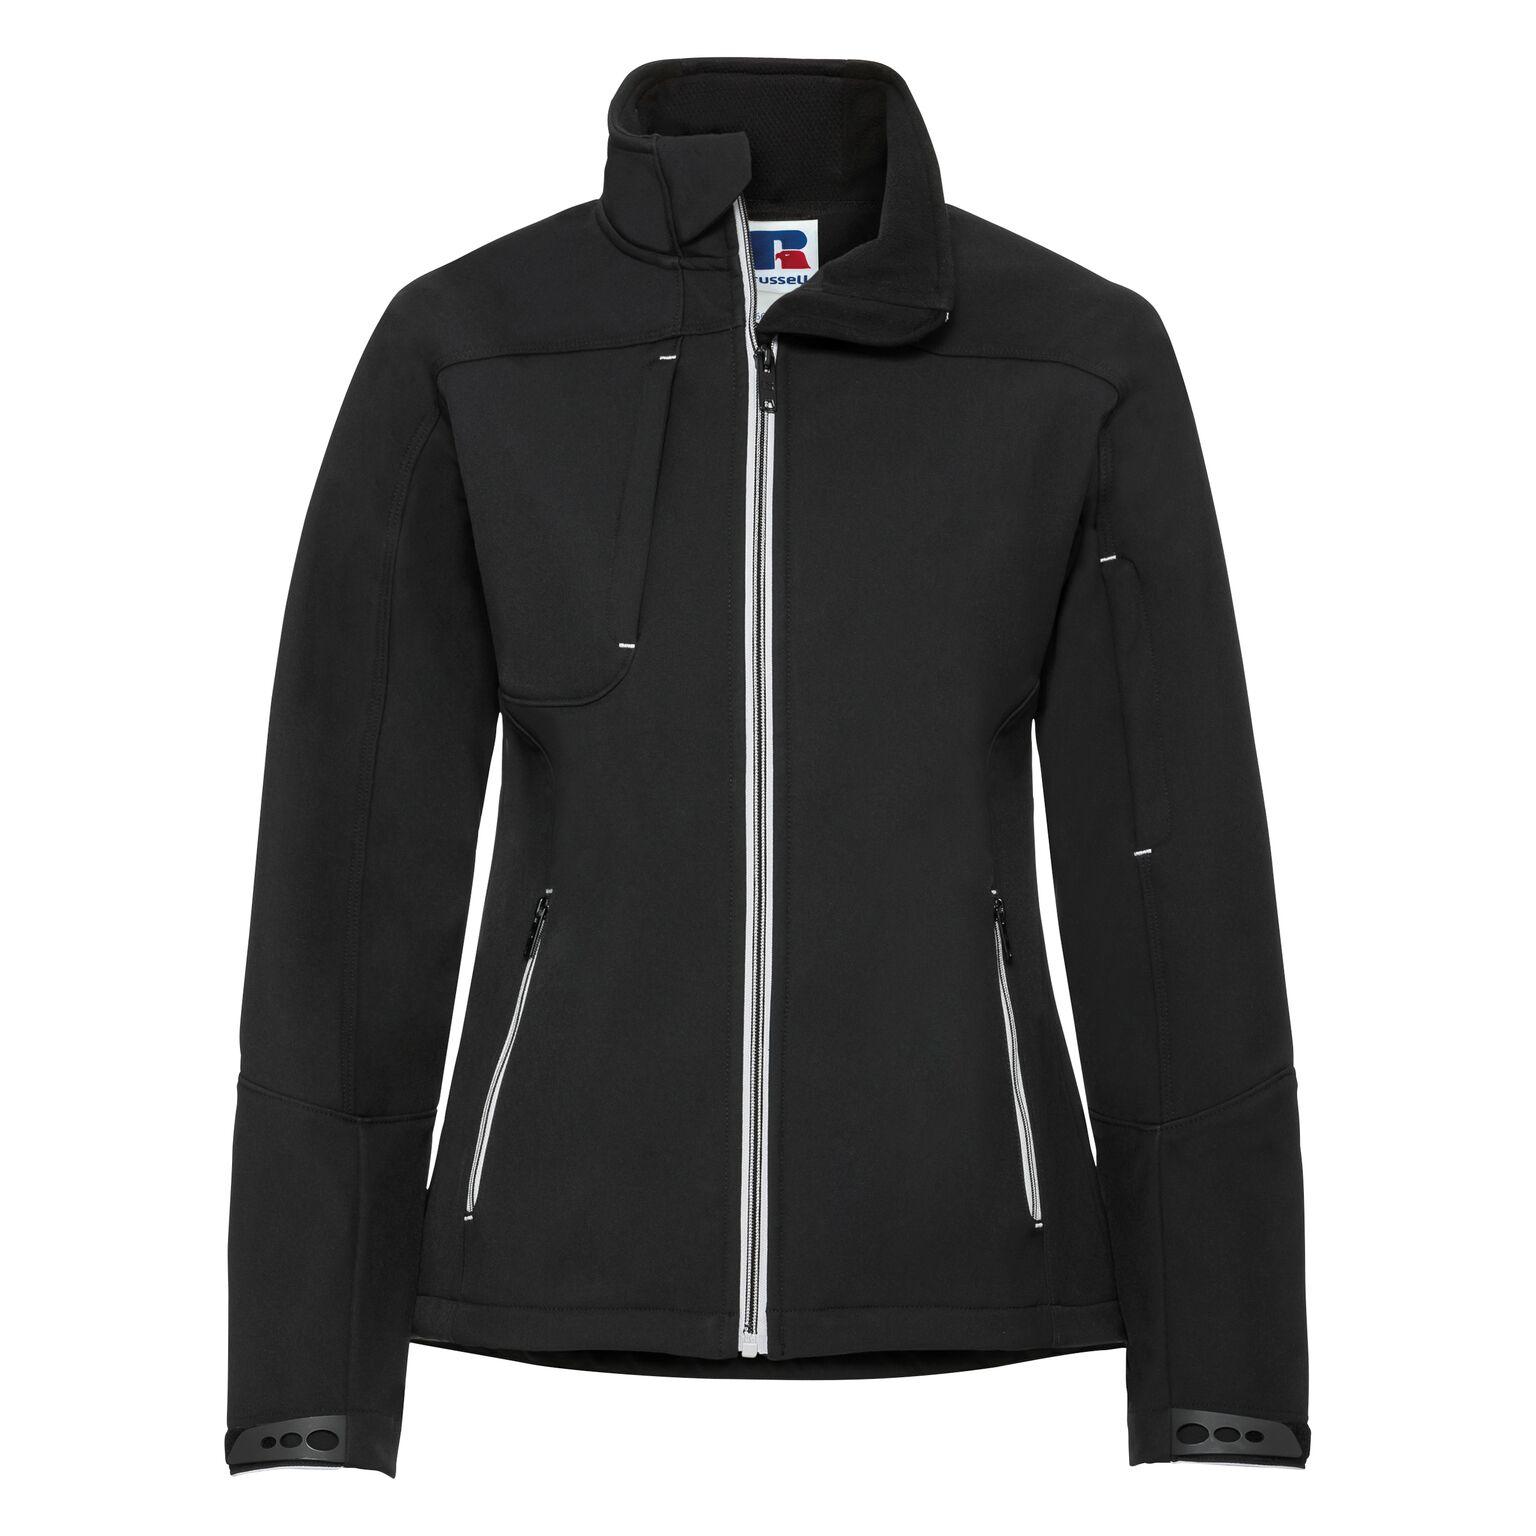 Russell Women/Ladies Bionic Softshell Jacket (XL) (Black)